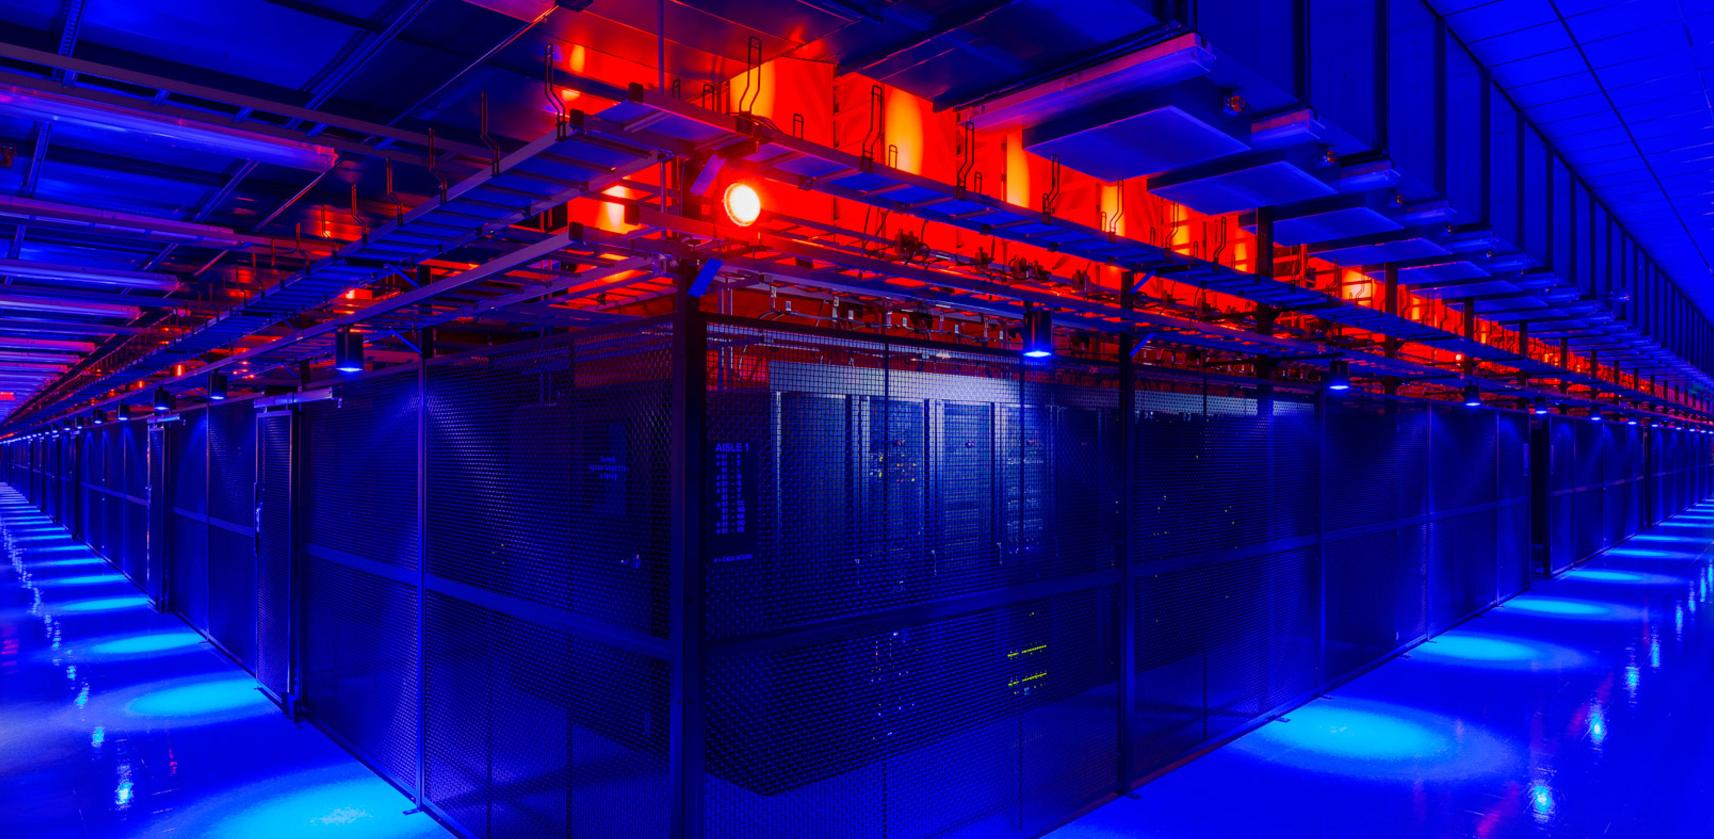 True Market Value >> Data Center Provider Switch Raises $531M in IPO | Data ...